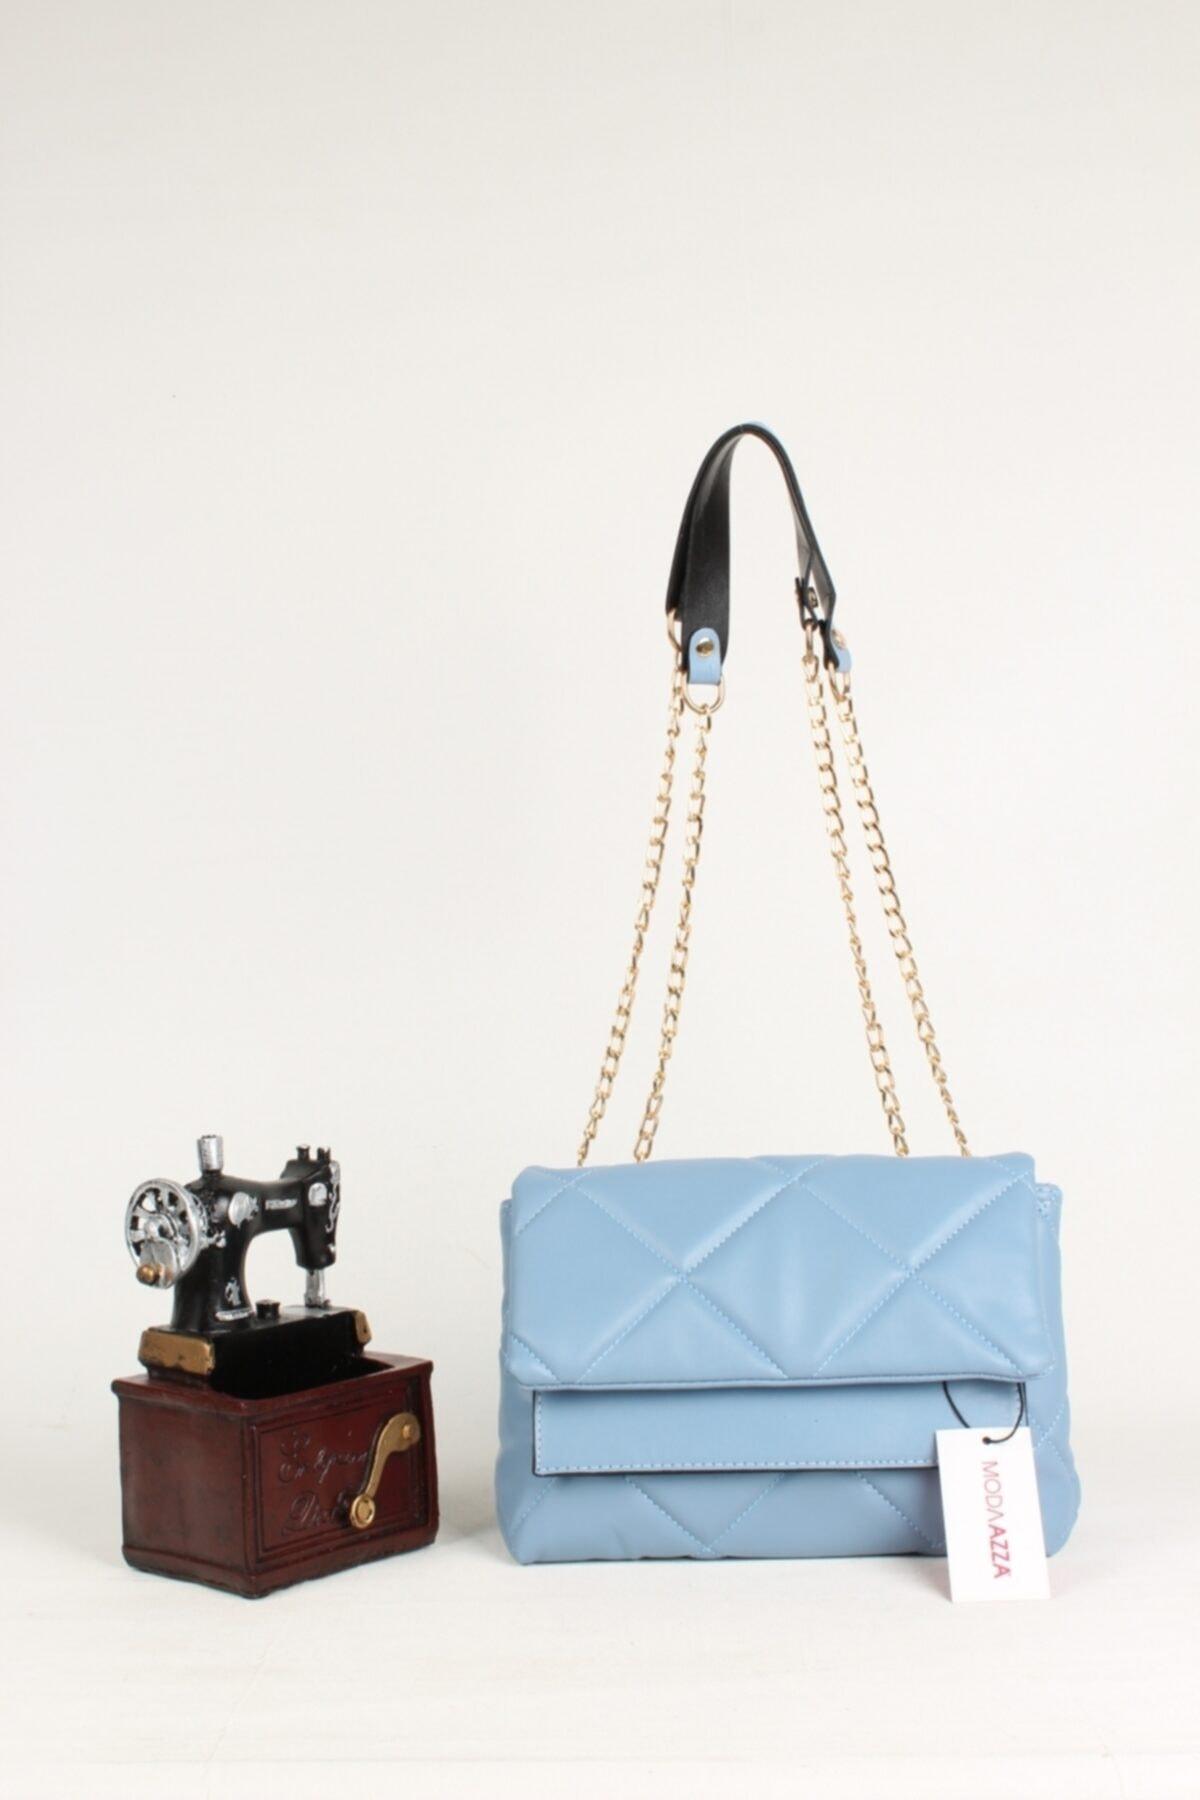 New Season 2021 Fashion Special Design Women S Blue Chain Strap Shoulder Bag Cross-Body Trend Handbag